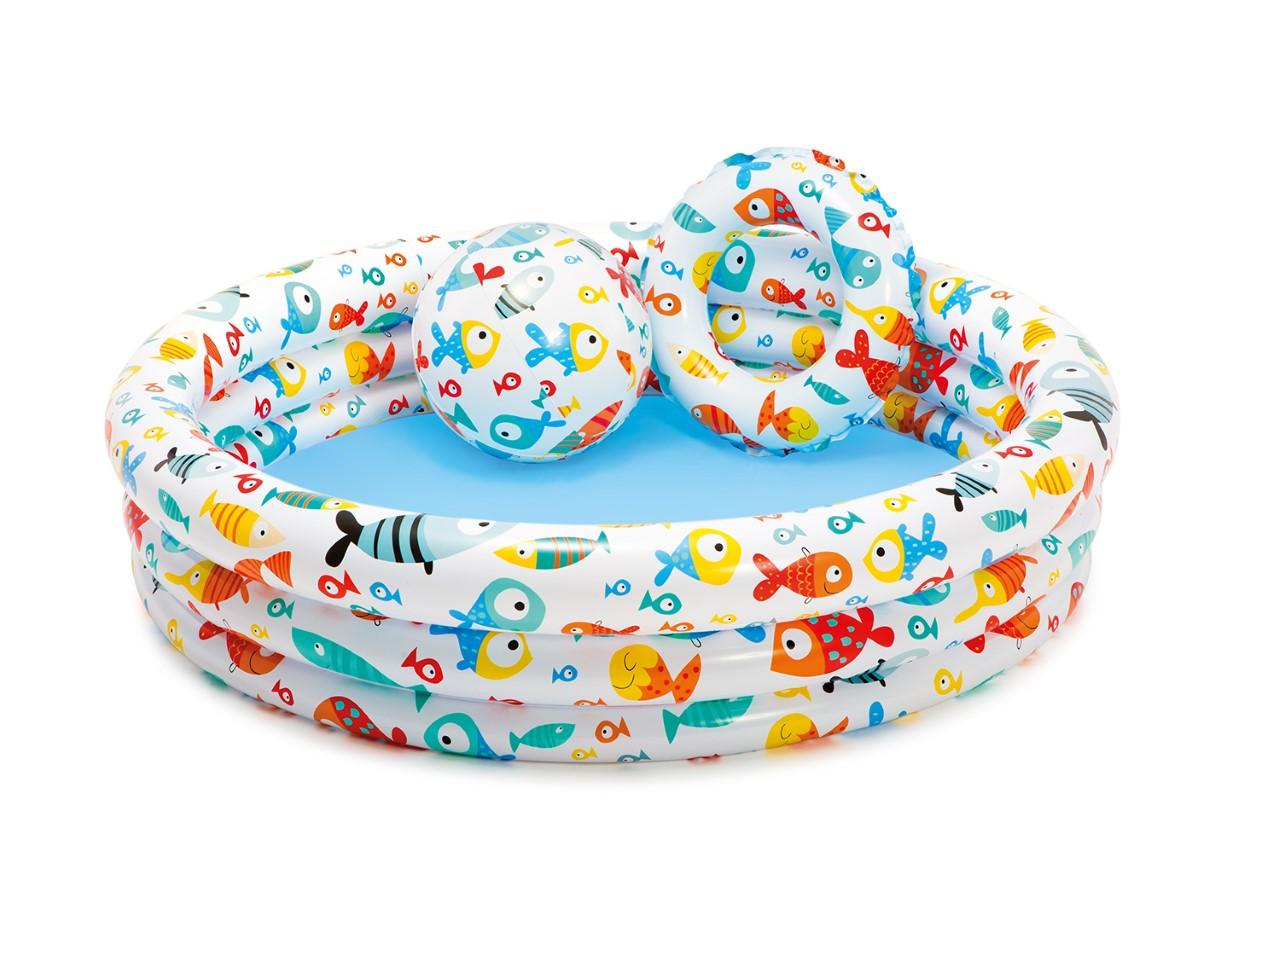 Intex Kinderzwembad Fishbowl set